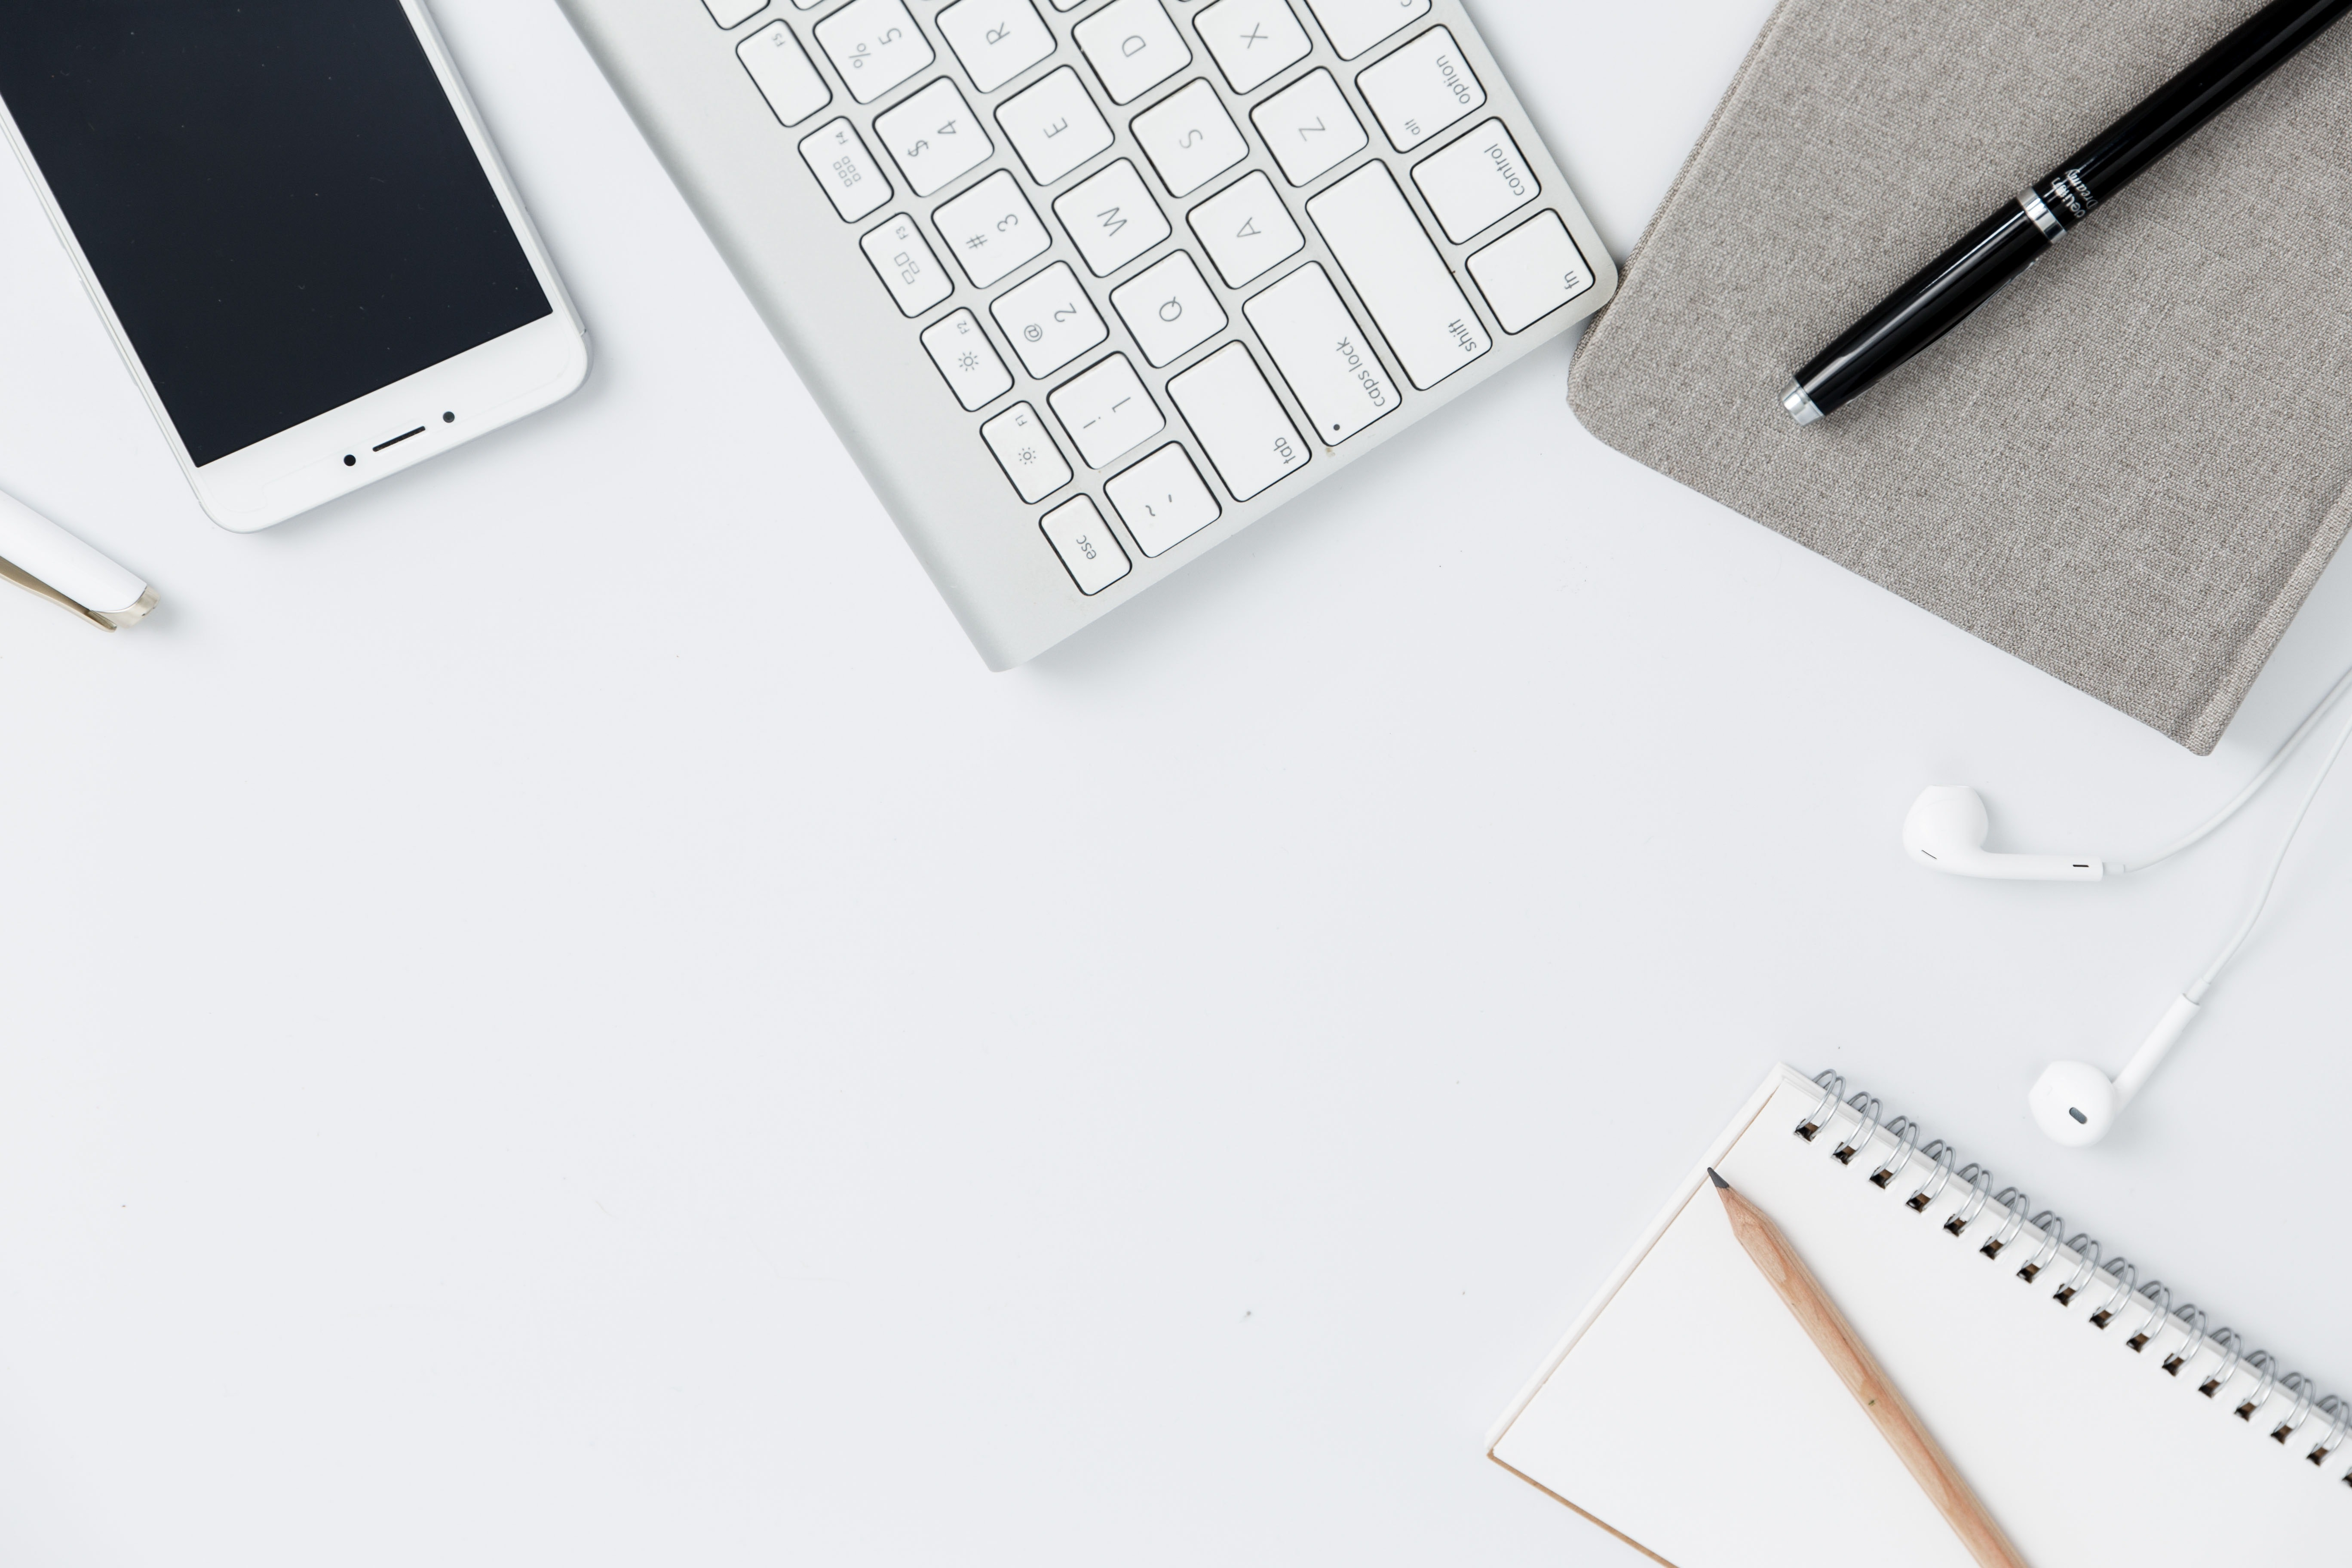 blank-business-composition-373076.jpg